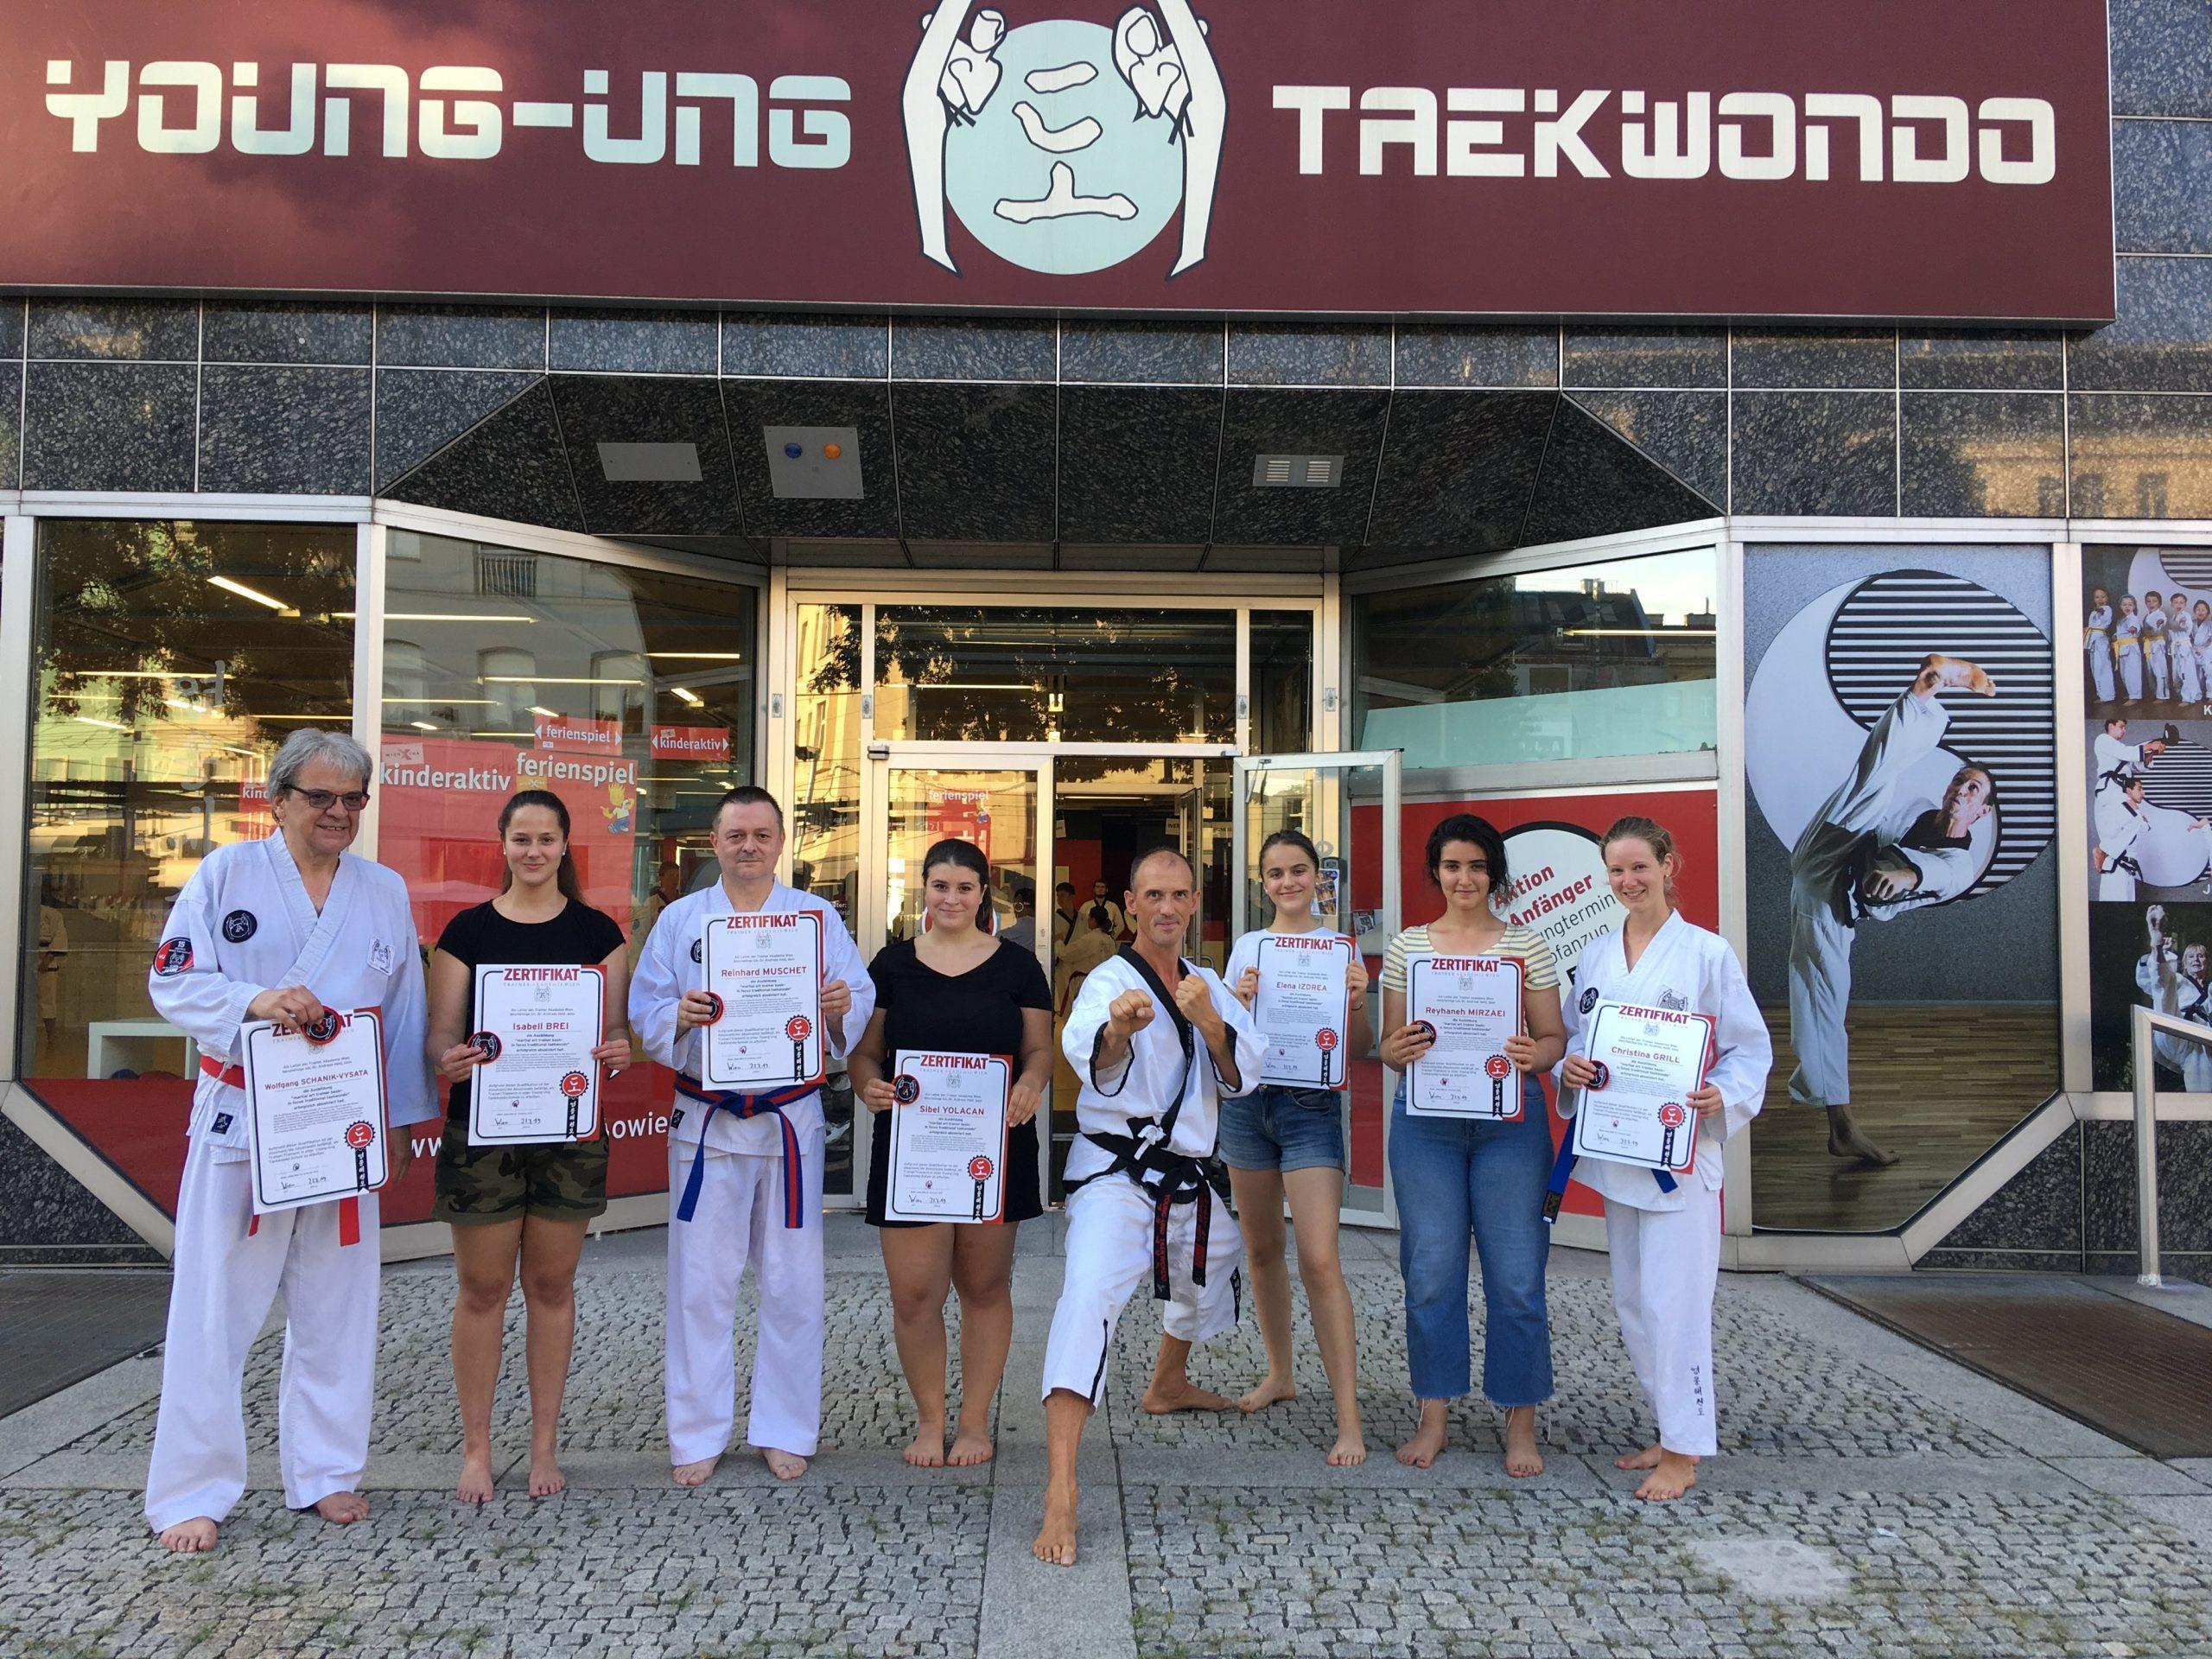 YOUNG-UNG Taekwondo Trainerakademie Ausbildung Zertifikat Kampfsport Trainer